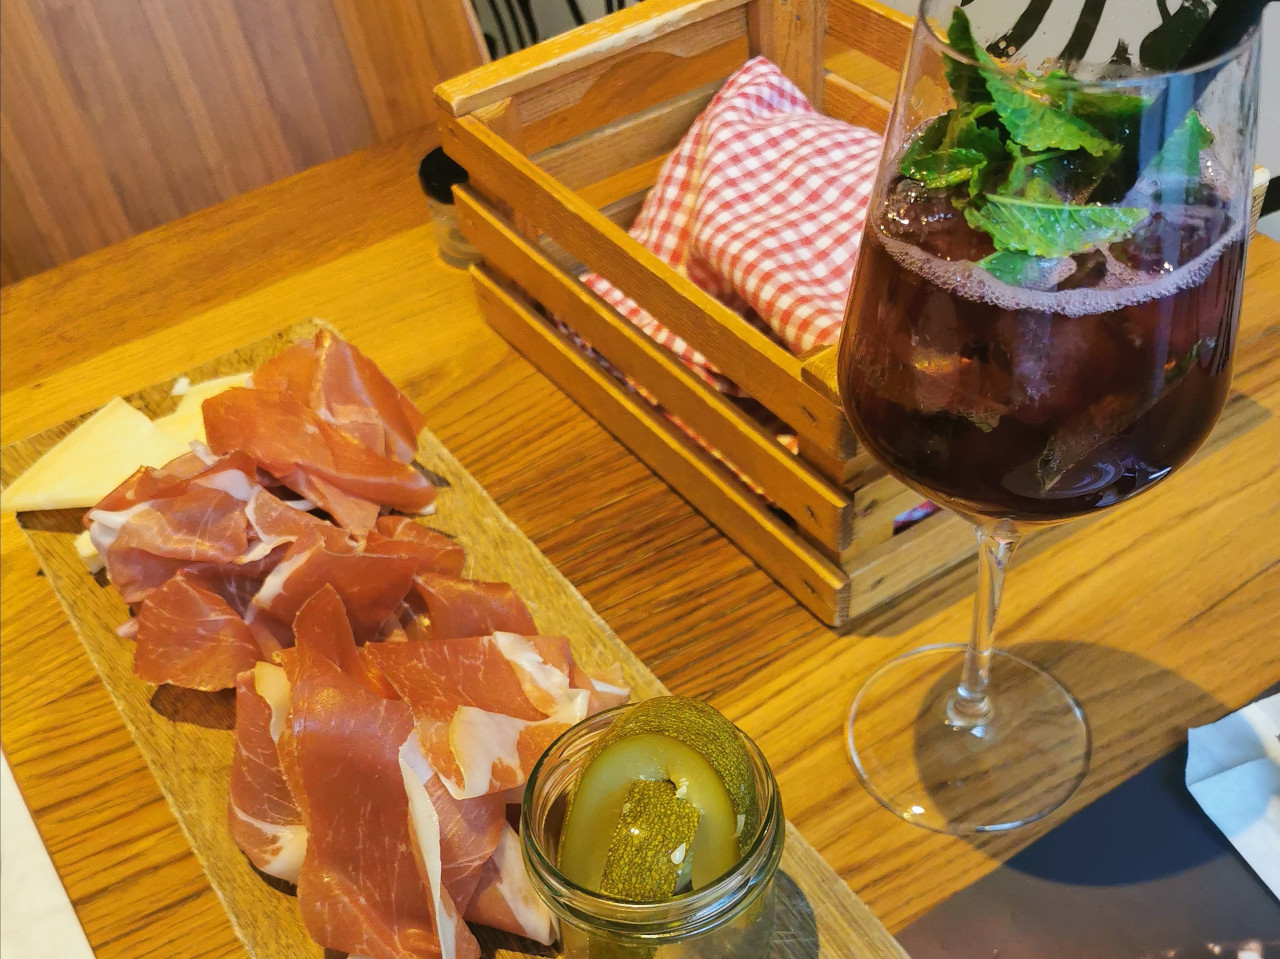 Traditional Slovenian food at Slovenska hiša. The perfect Ljubljana city guide